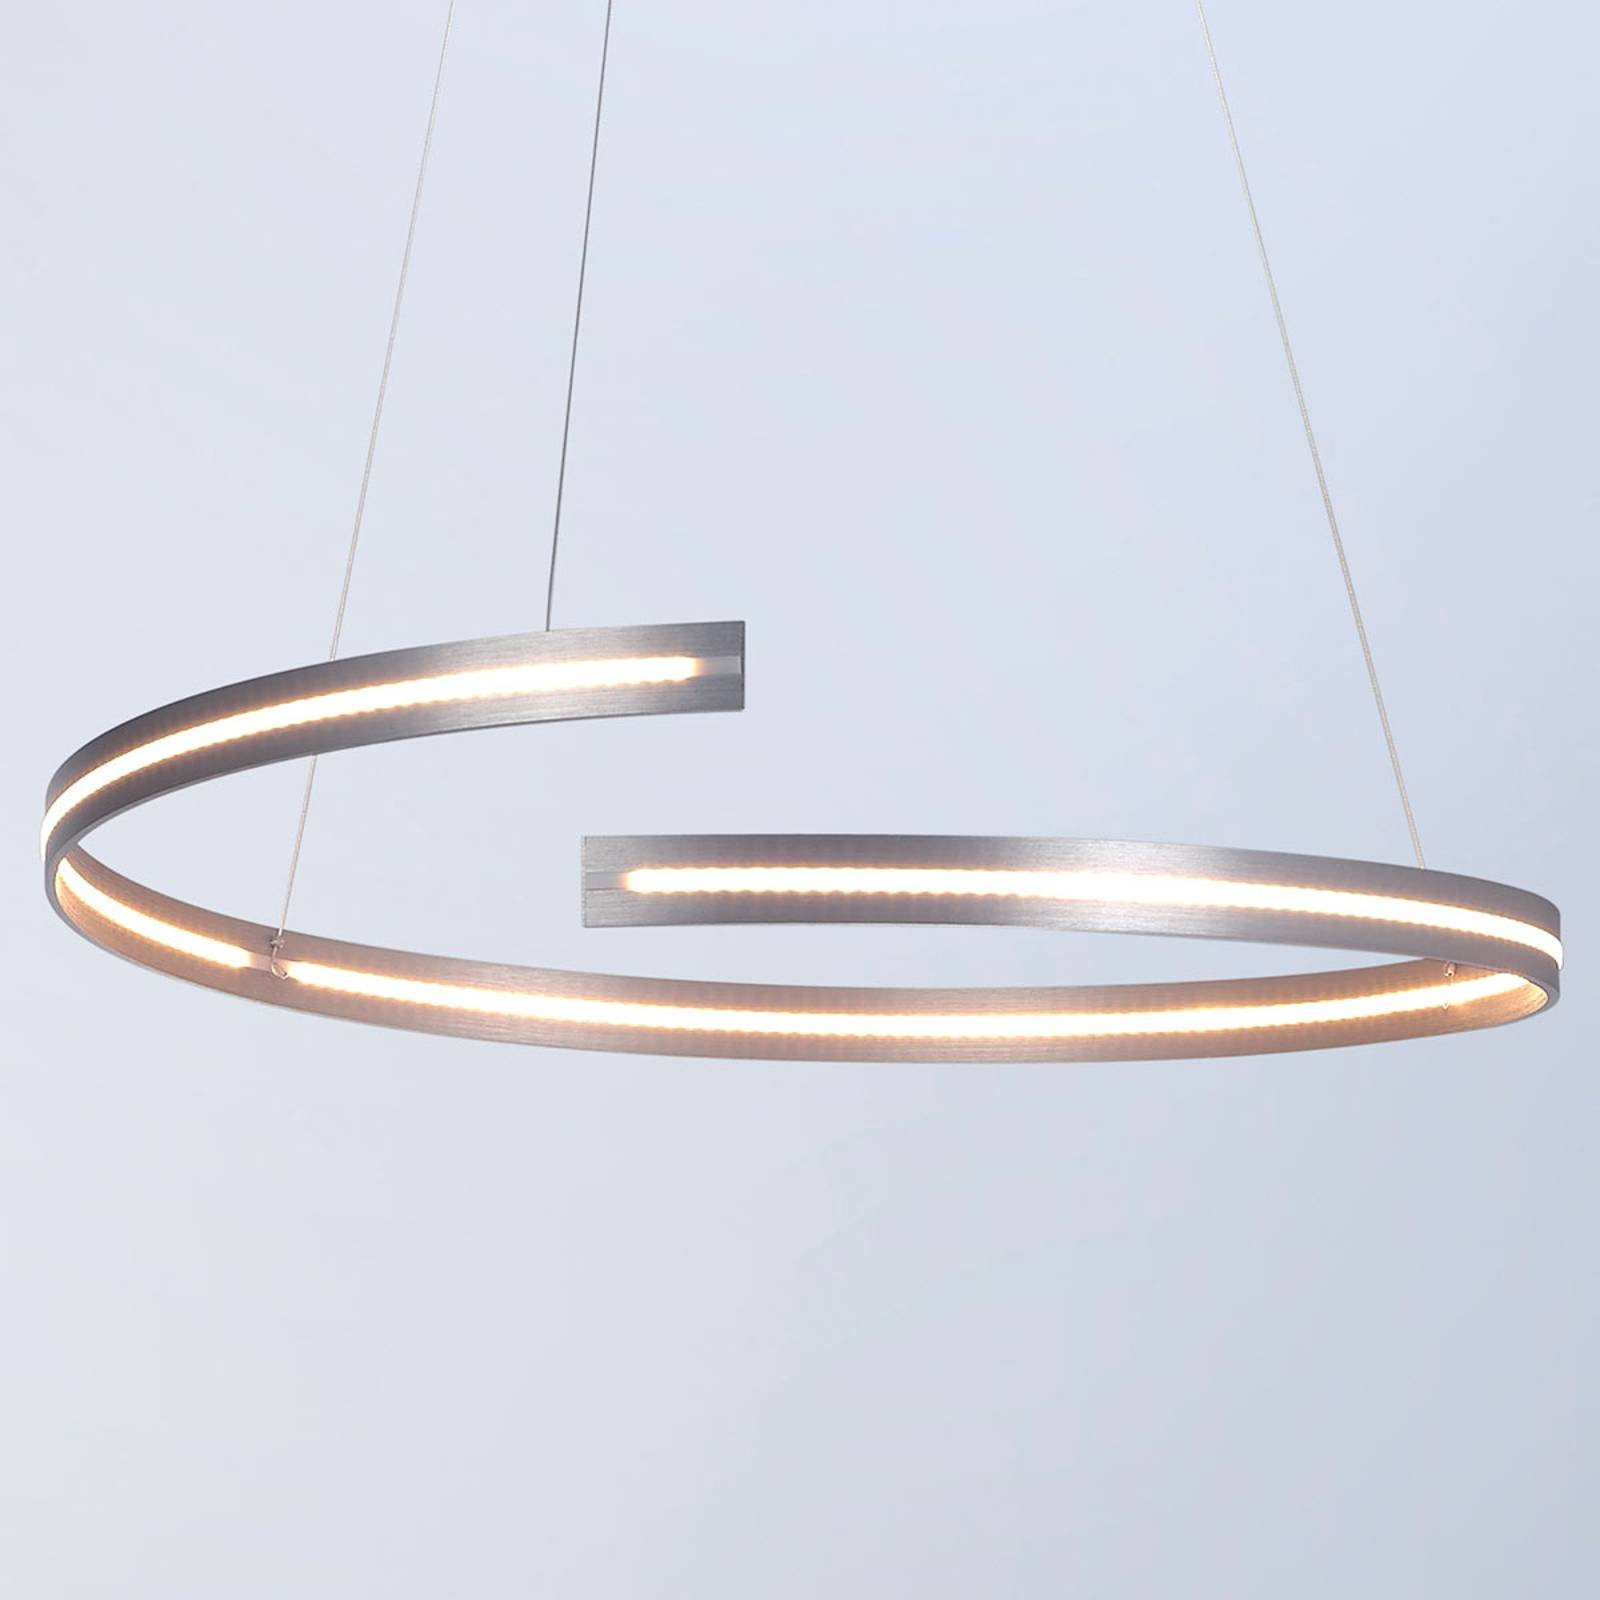 Bopp Break - LED-Hängeleuchte, 70 cm alu